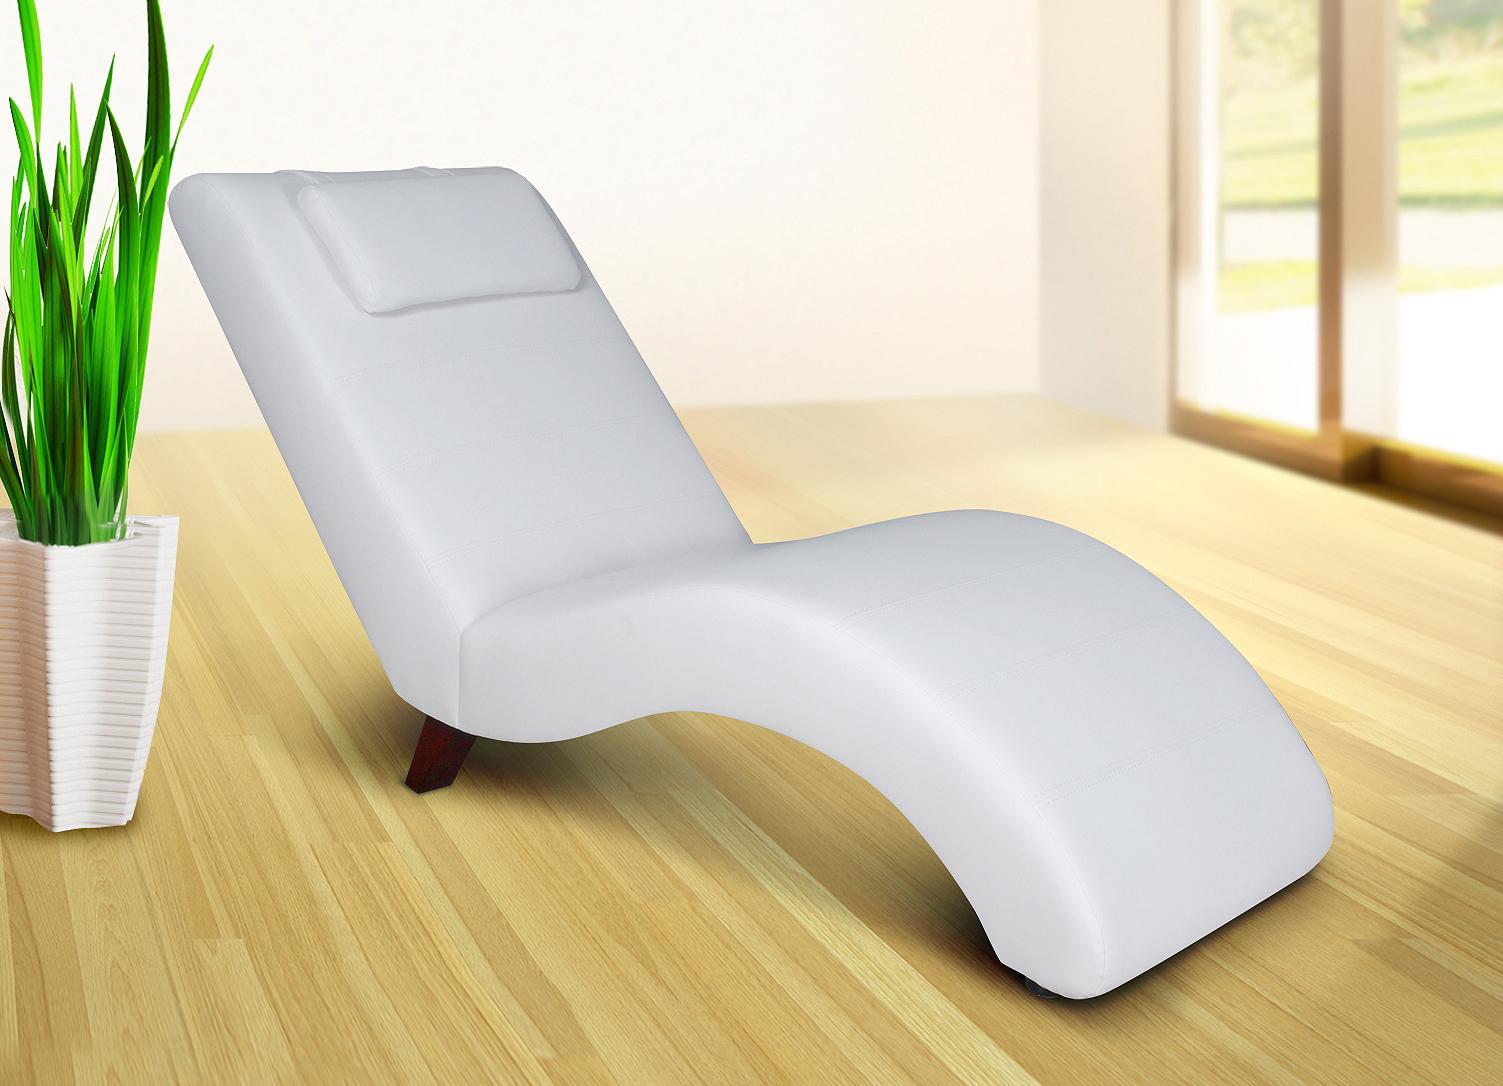 Relaxliege liege faro wei liegesessel sessel for Sessel mit stoffbezug liegesessel